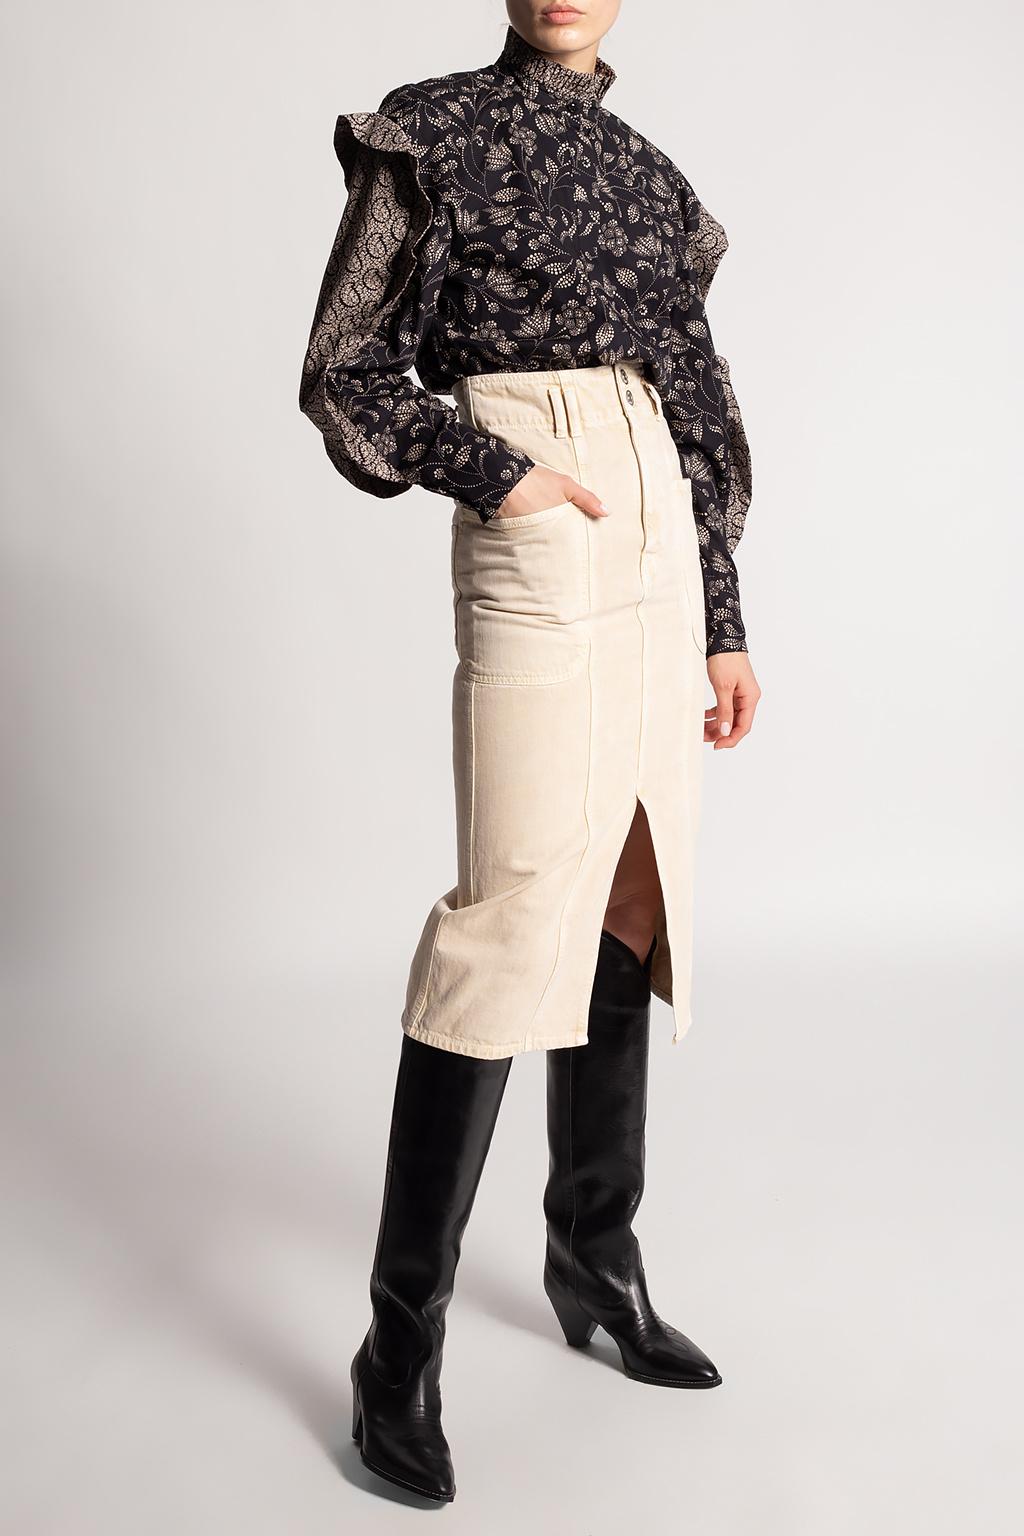 Isabel Marant Etoile Patterned top